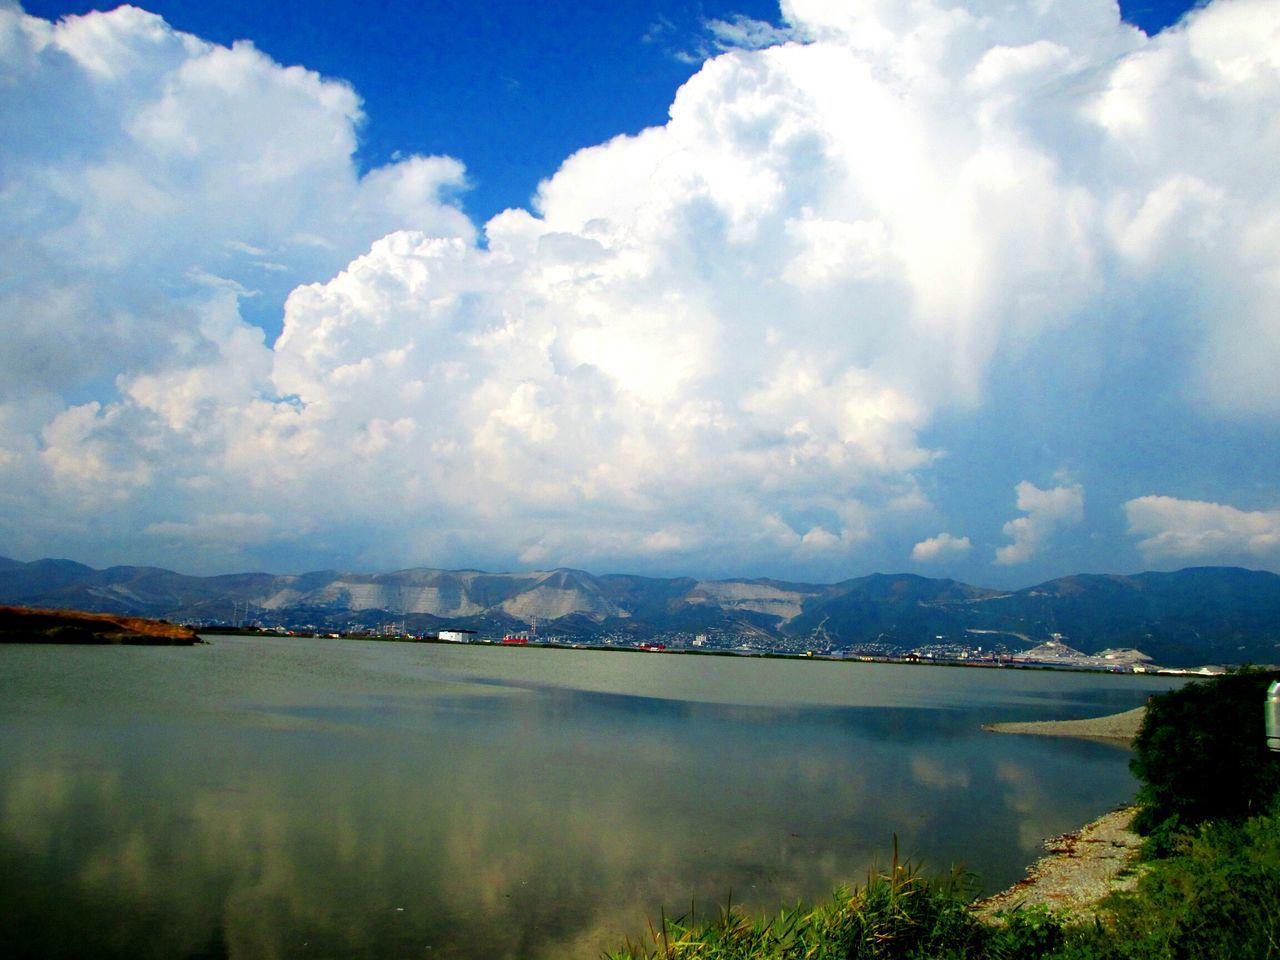 Novorossiysk новороссийск2016 нежность рассвета Природа Beautiful Nature рассвет Nature утро Morning Day Green Color Beautiful Day Beauty In Nature Beautiful лиман